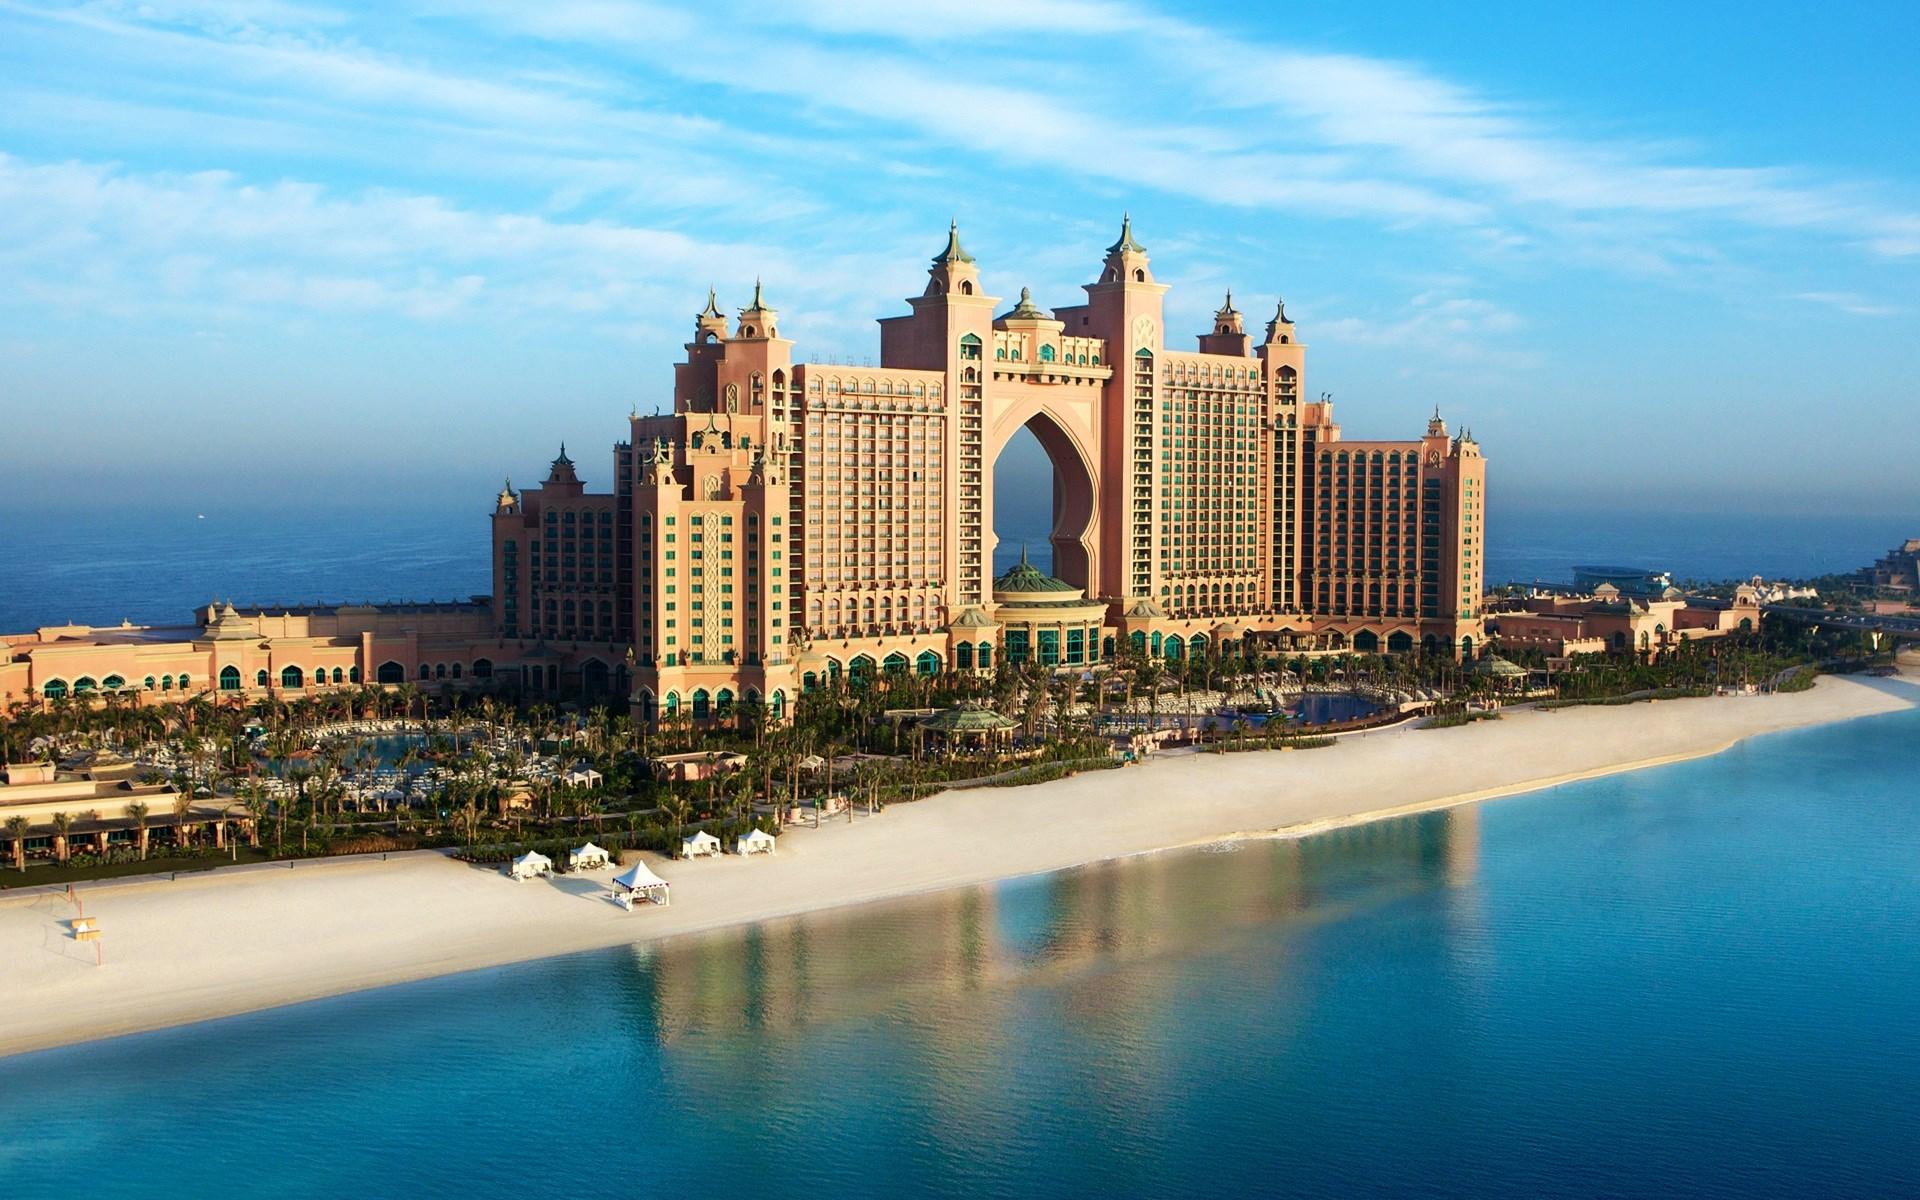 Atlantis The Palm Beach Dubai Wallpaper 1920x1200 768x480